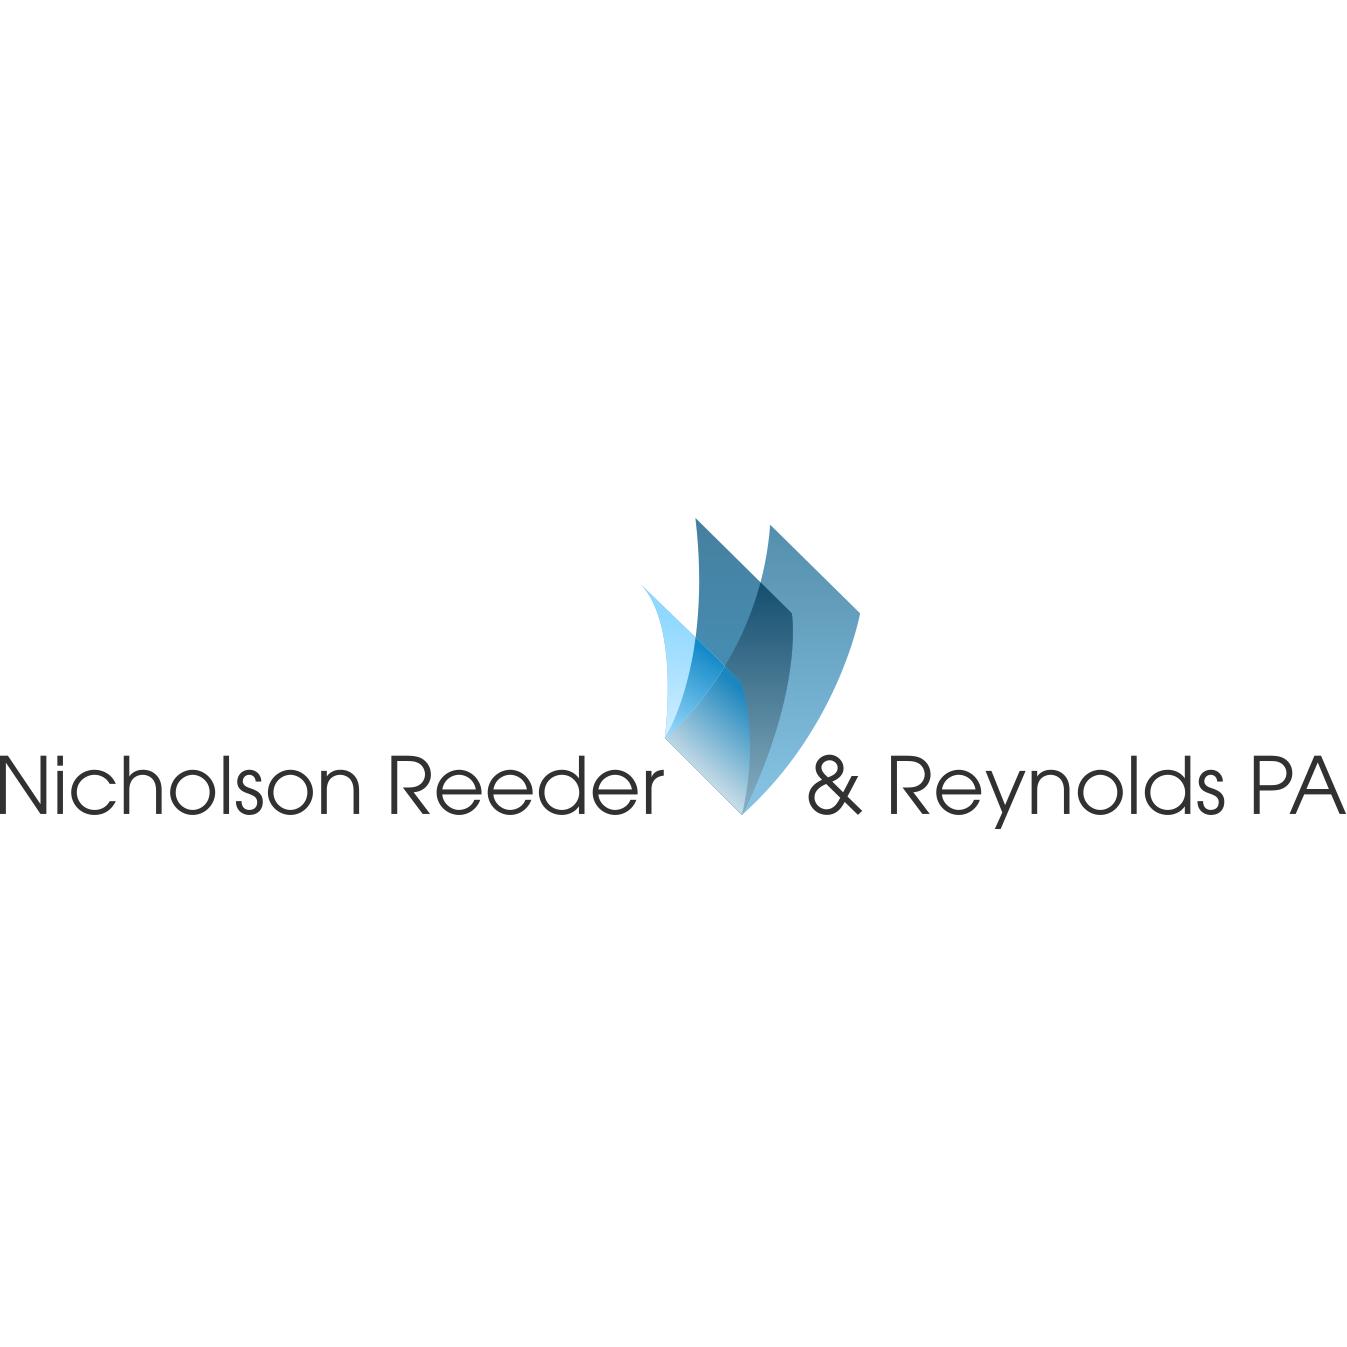 Nicholson Reeder & Reynolds PA